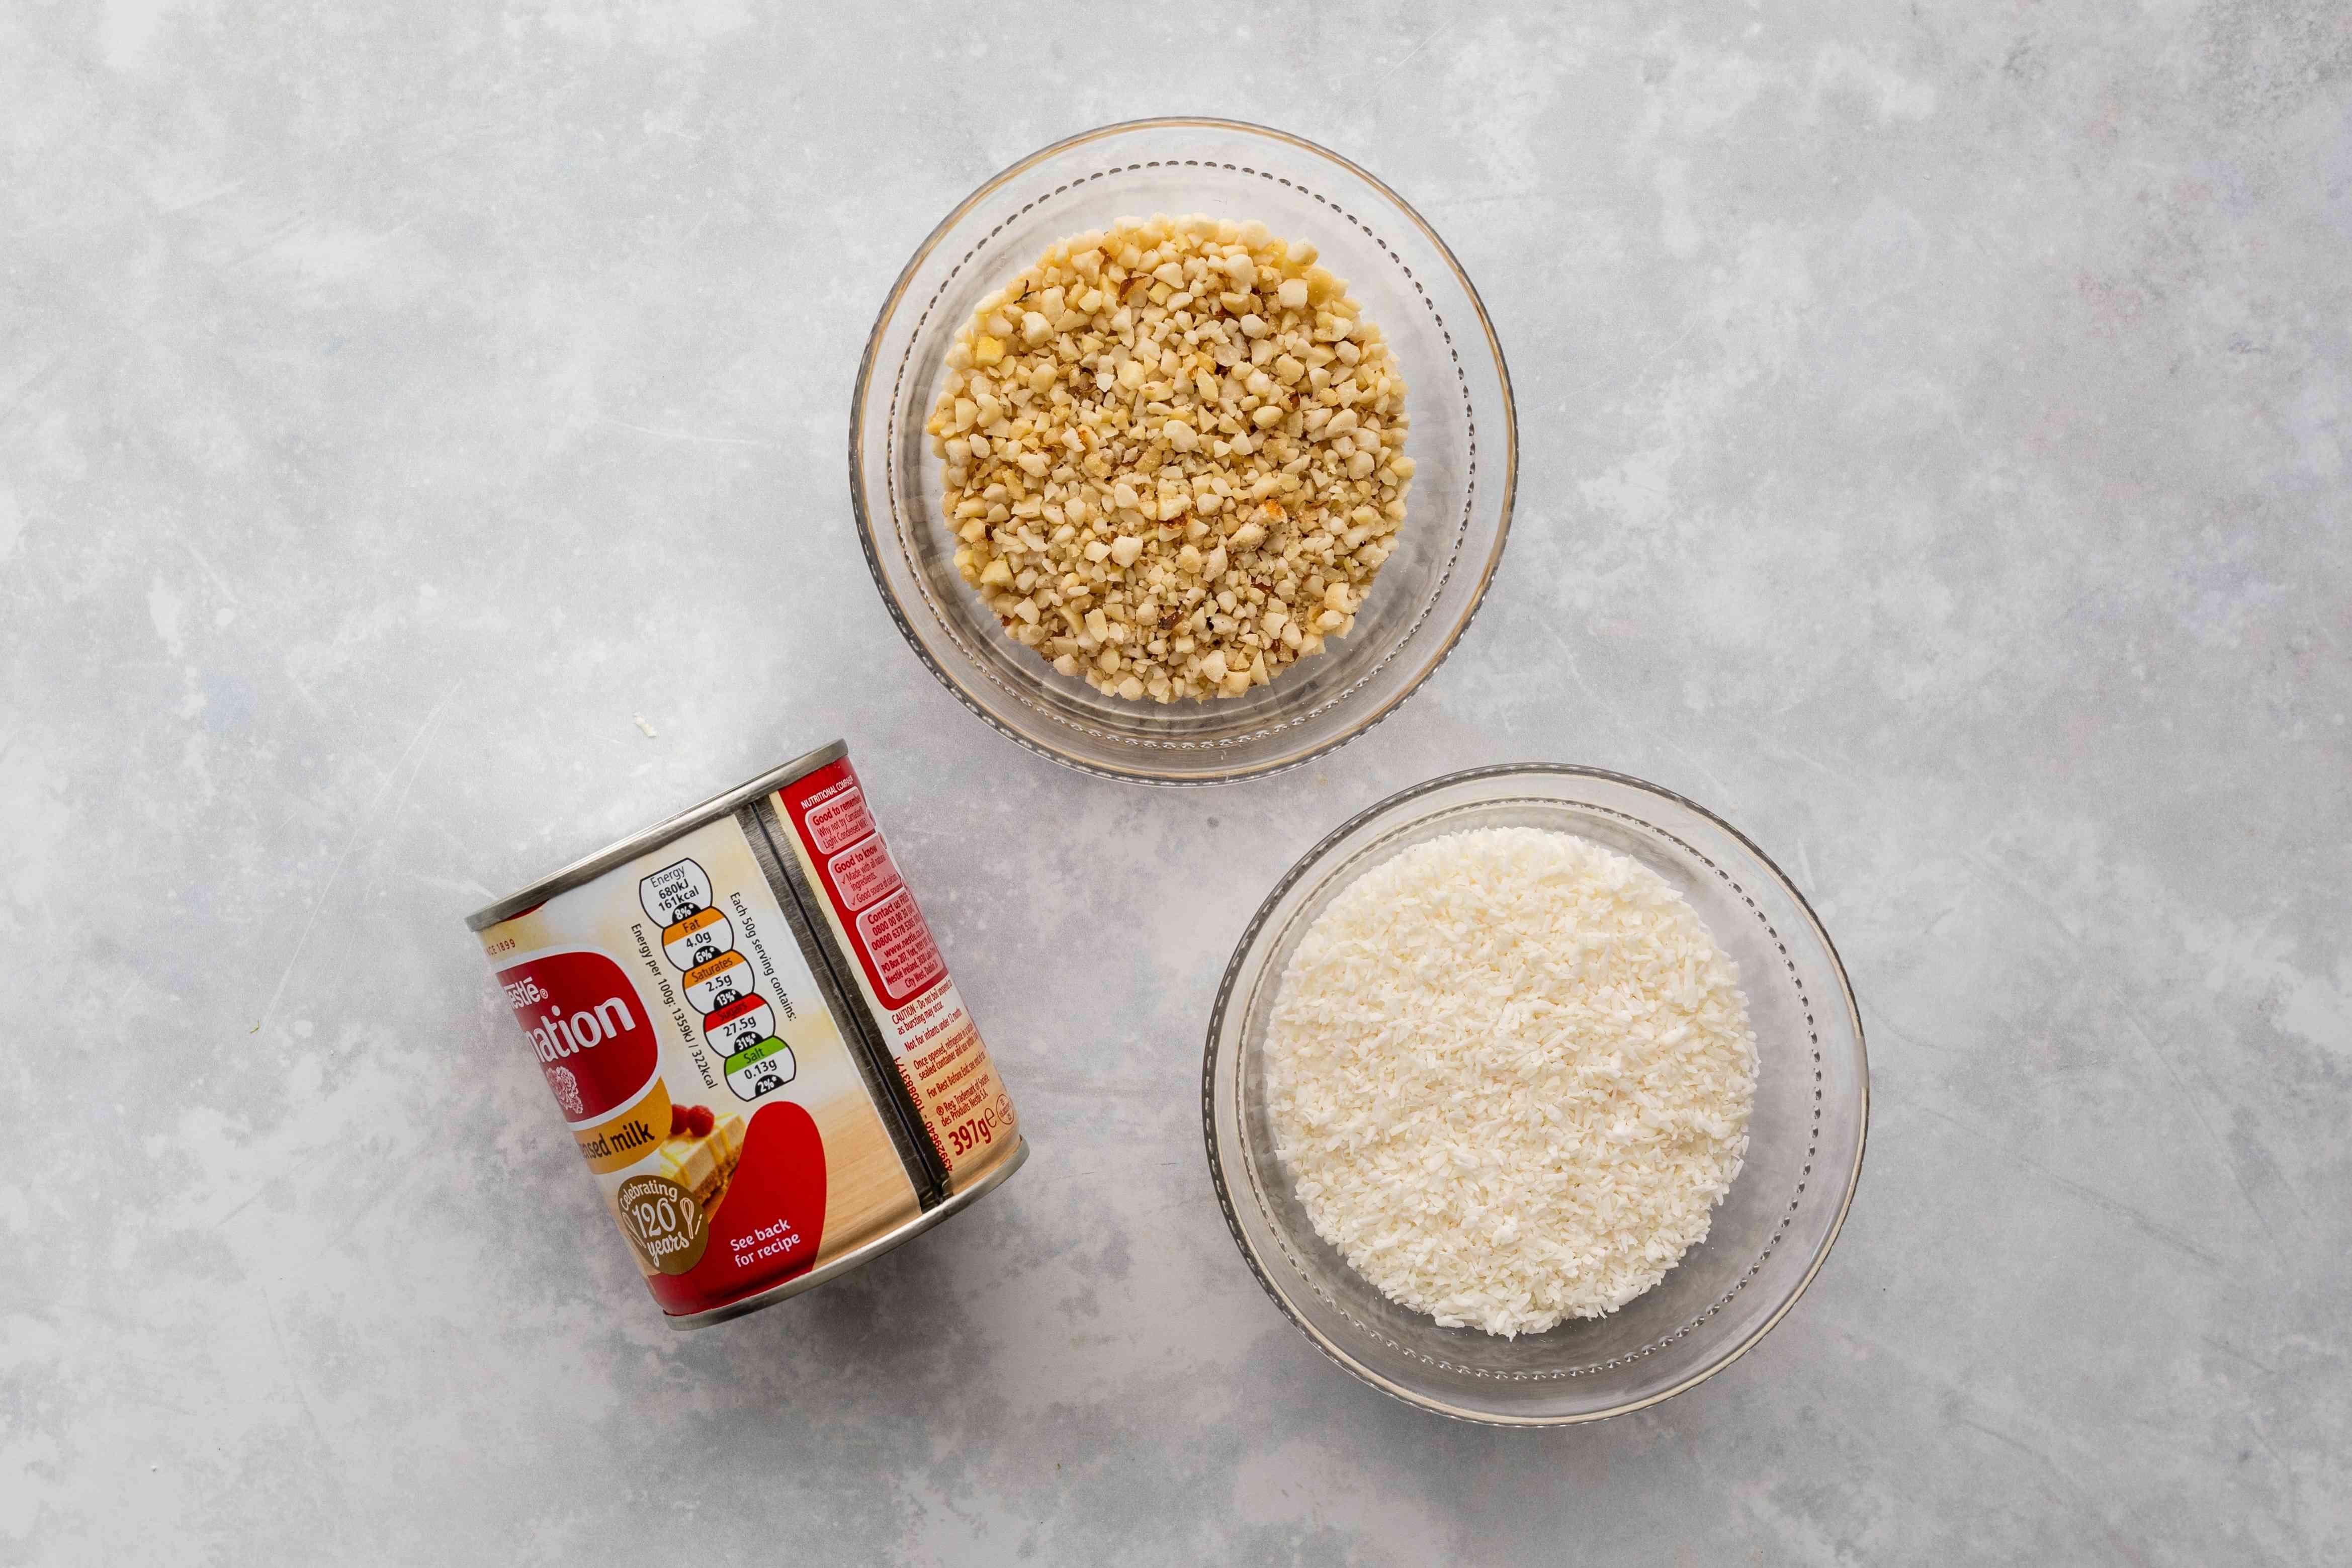 Ingredients for dulce de leche